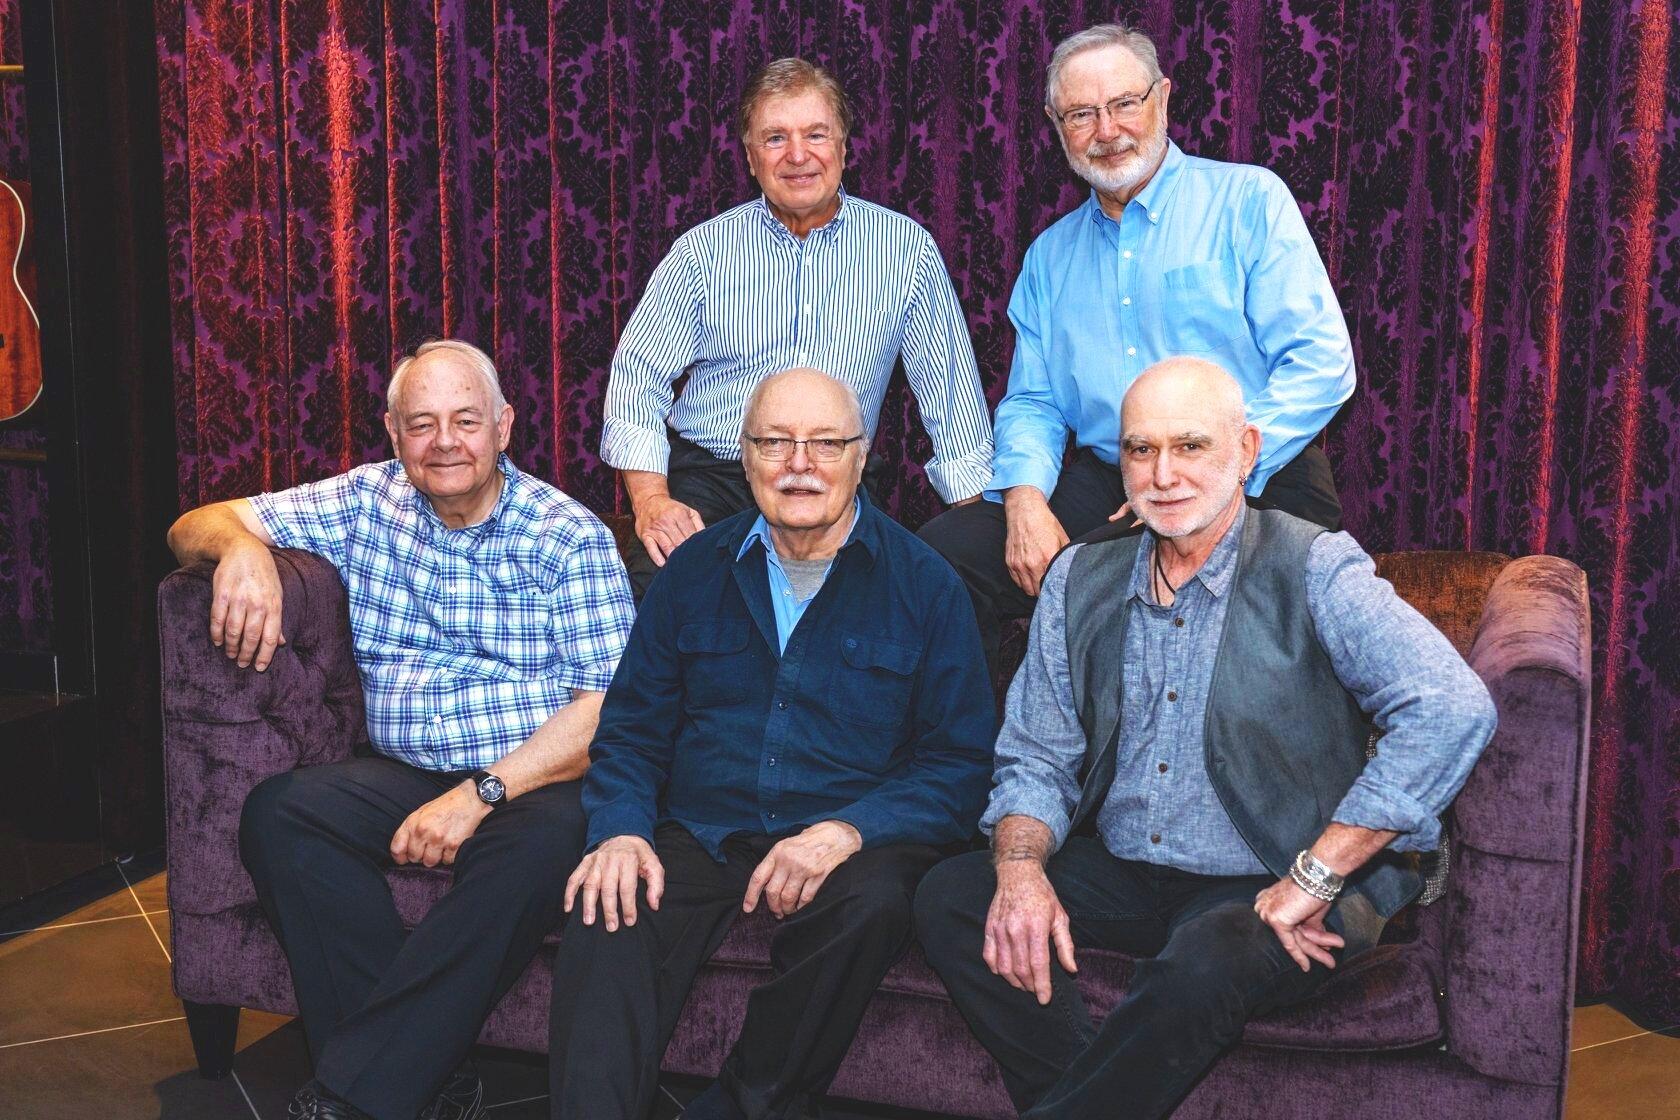 The St. Louis Jesuits (September, 2019): Bob Dufford, Jon Foley, Tim Manion, Dan Schutte, and Roc O'Connor.